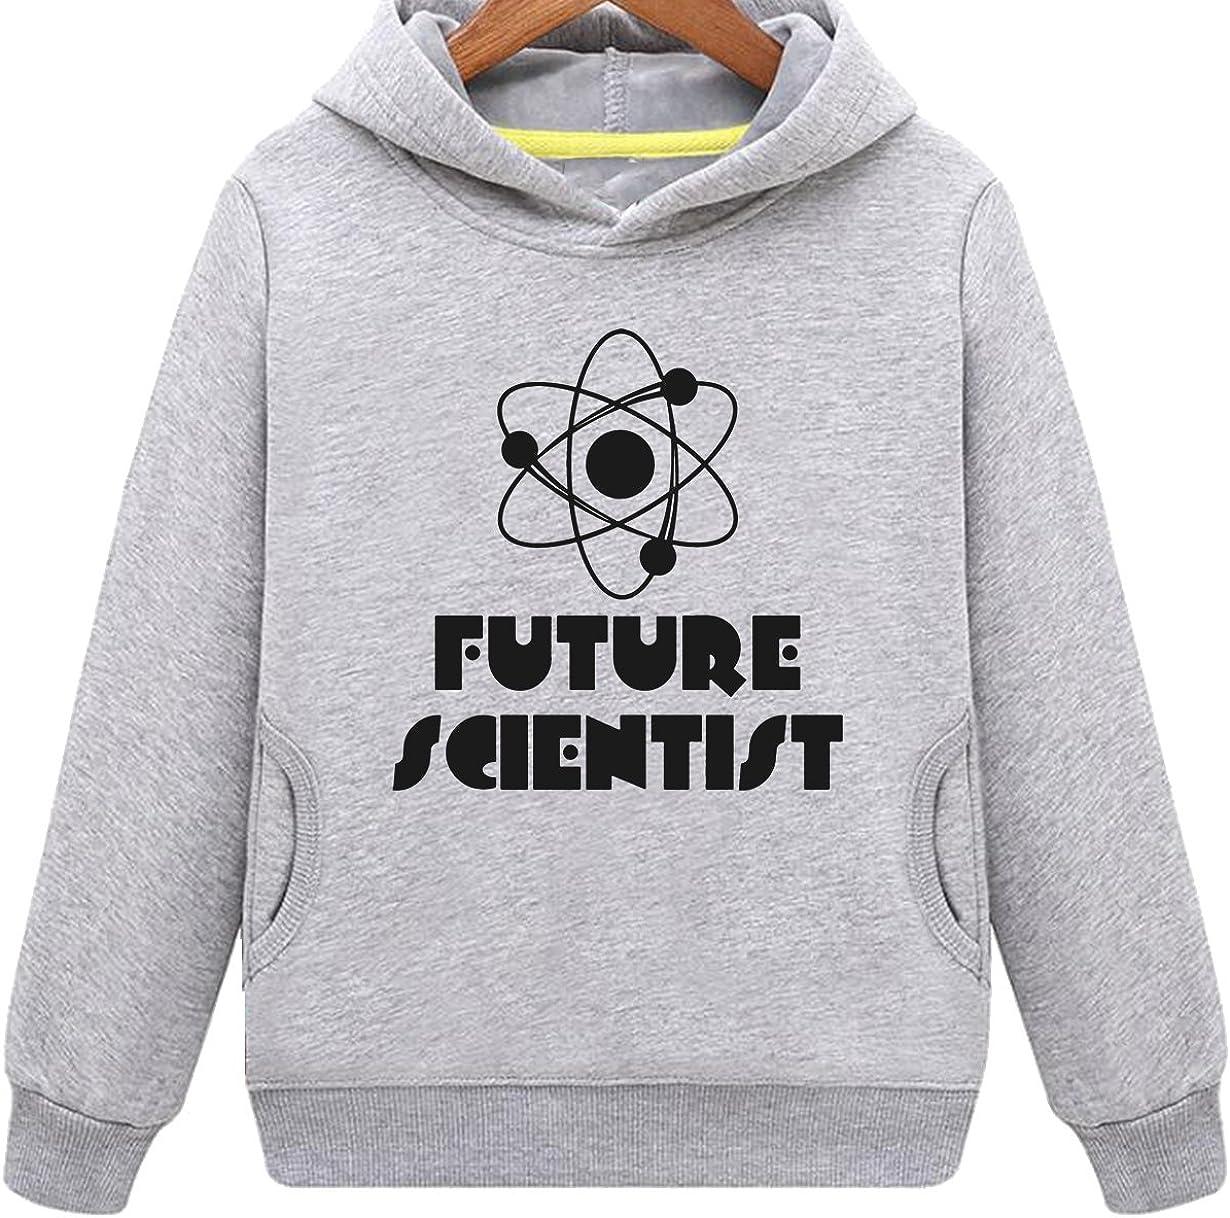 Kids Two Pockets Future Scientist Hoodie